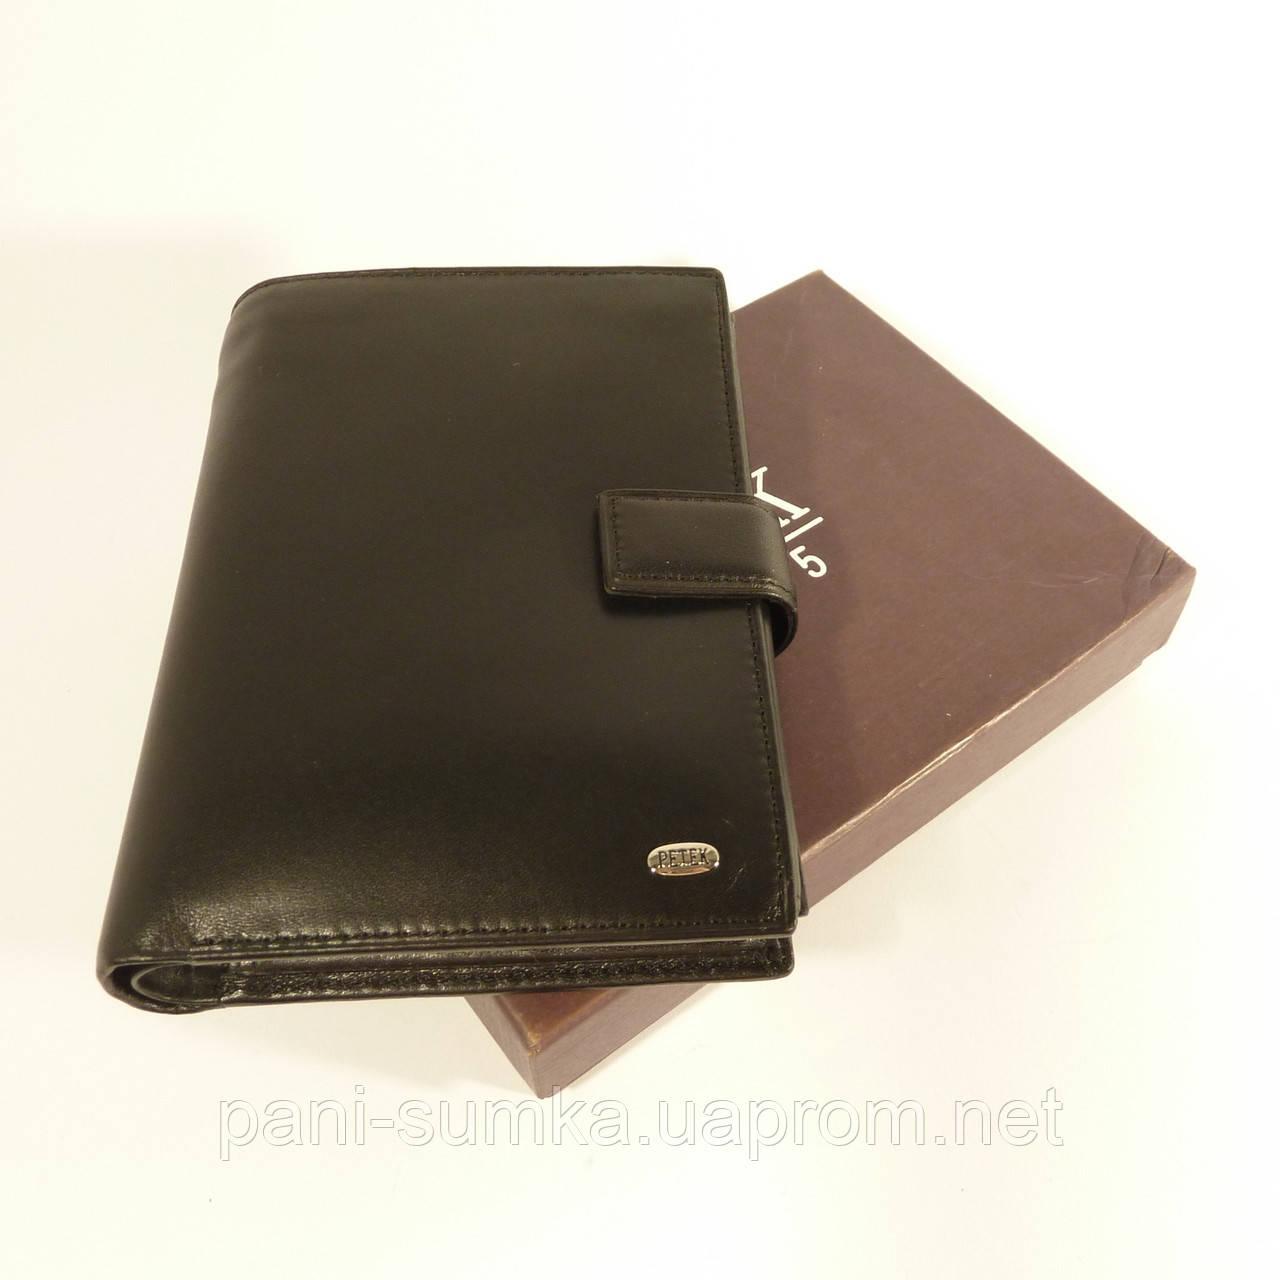 672d3069b317 Портмоне, документница мужская кожаная Petek 1735 паспорт, права, наличие -  Интернет магазин